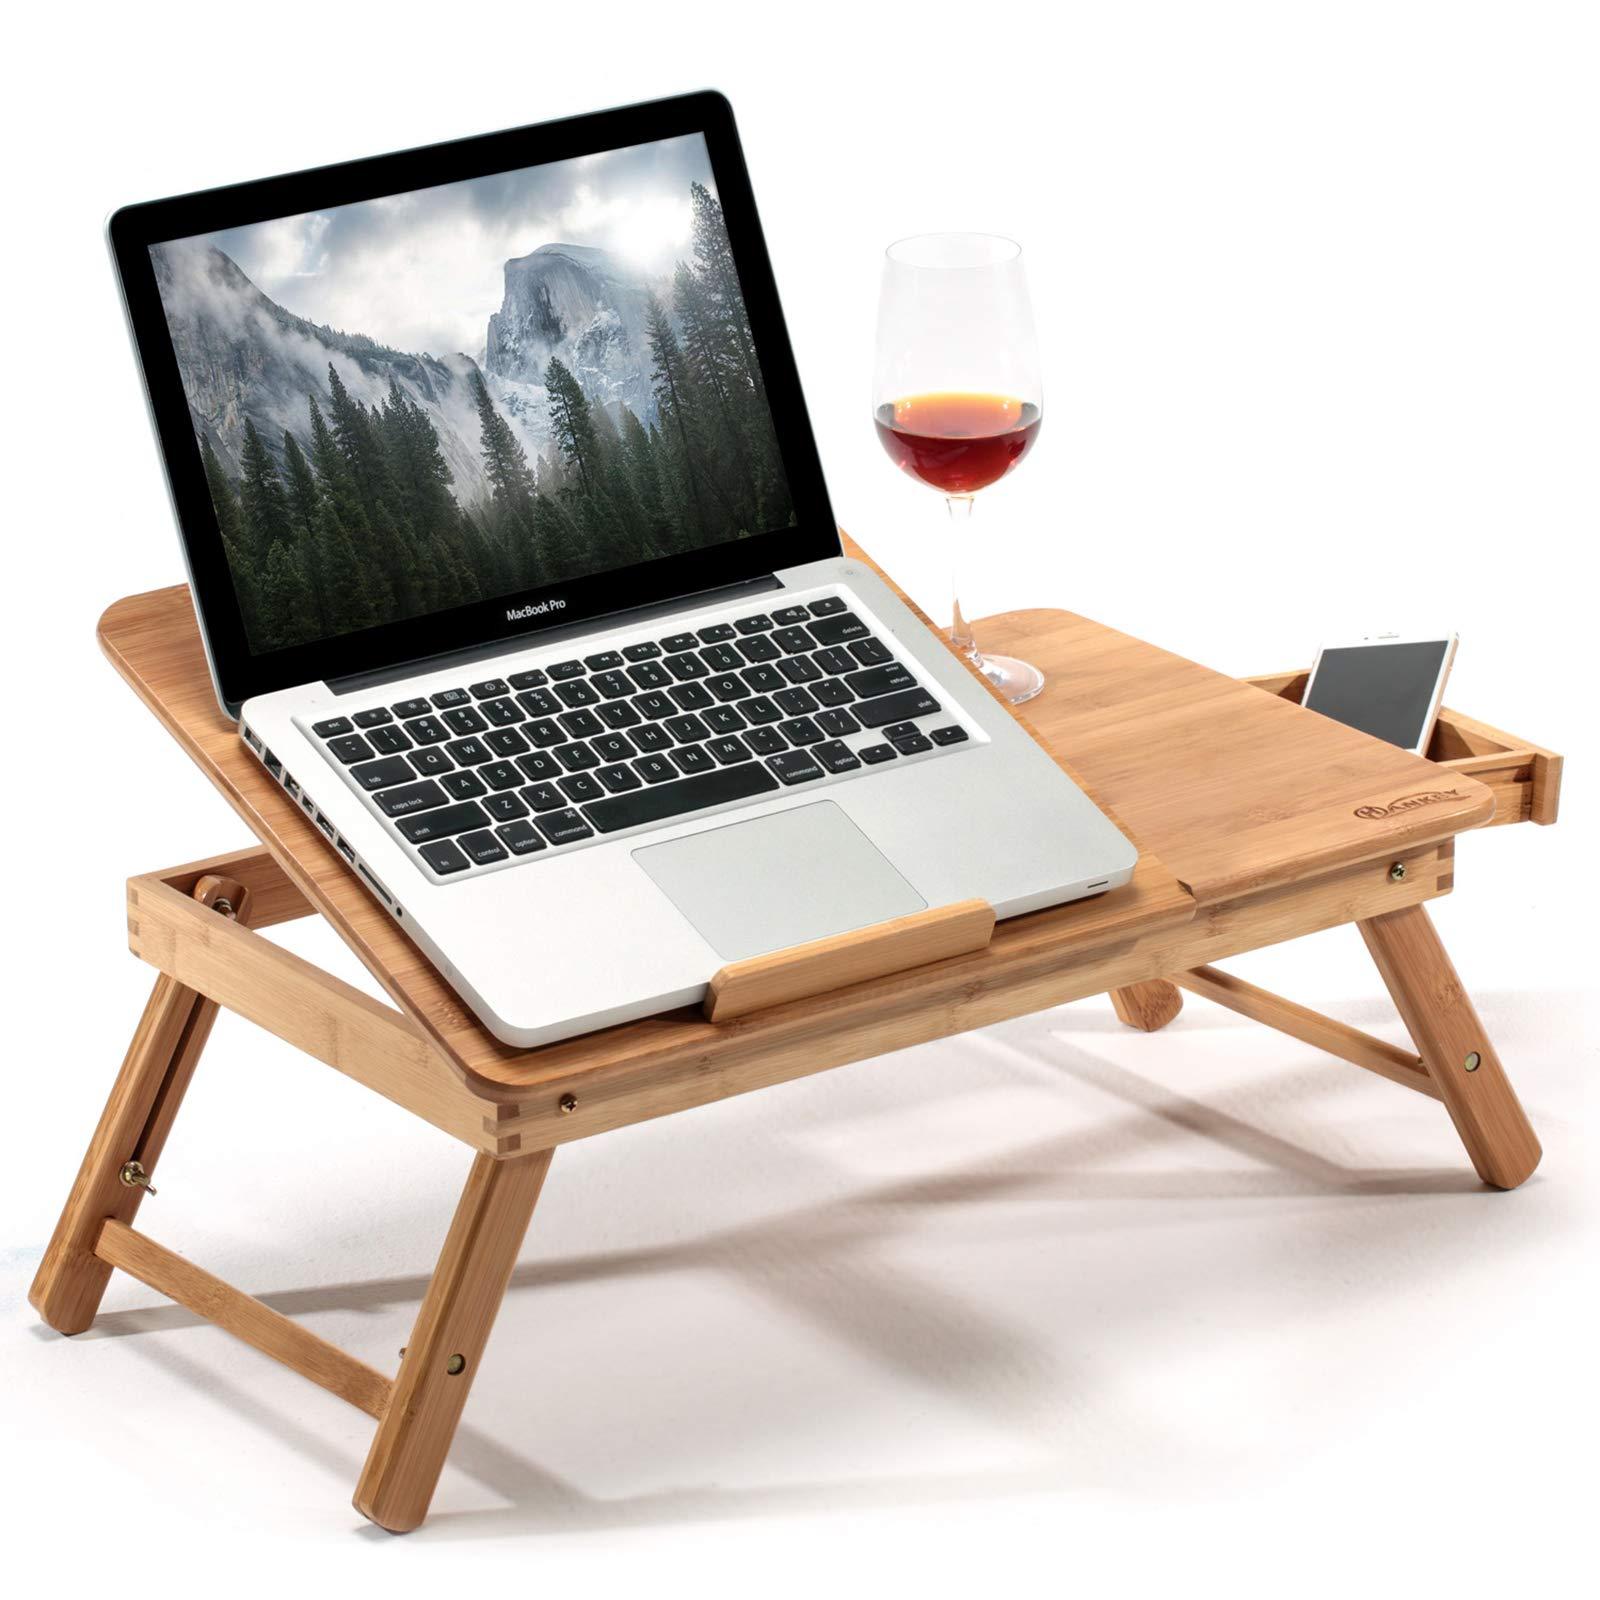 Mesa Plegable y Ajustable para Notebook - HANKEY - 1IETZ2VK